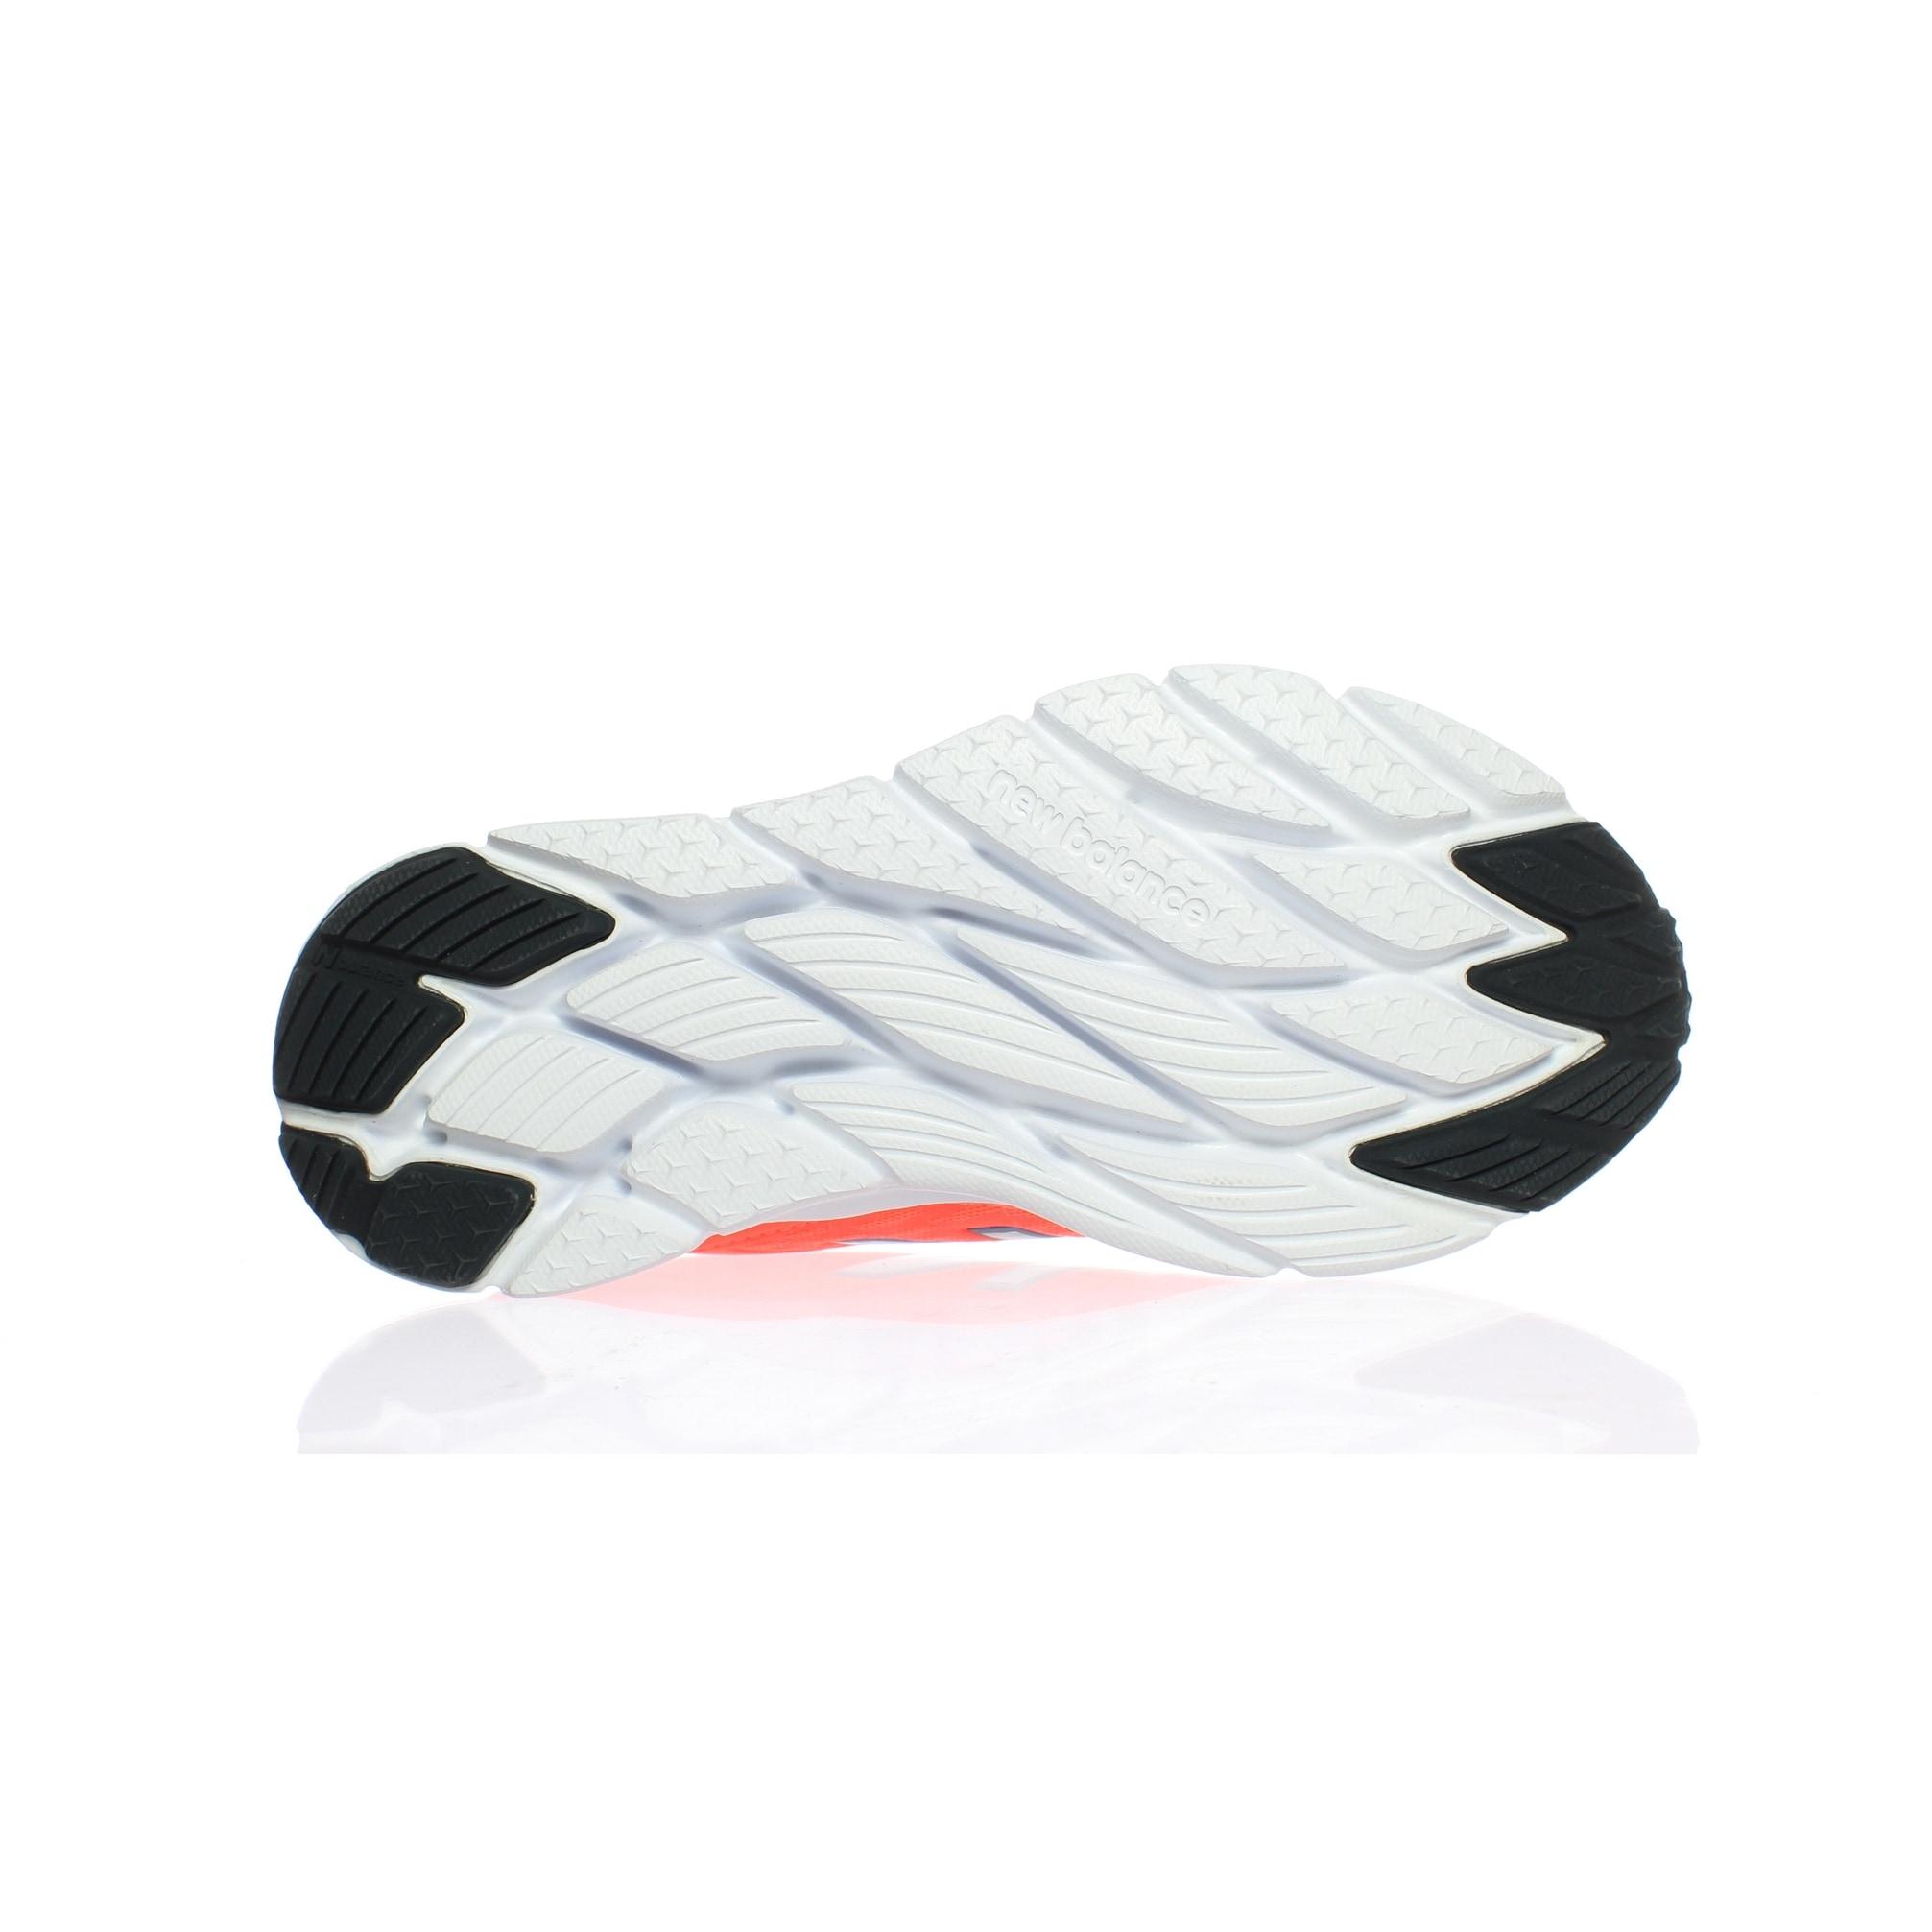 condensador pistón Pizza  New Balance Womens W775ld2 Orange/Silver Running Shoes Size 5 (C,D,W) -  Overstock - 25585990